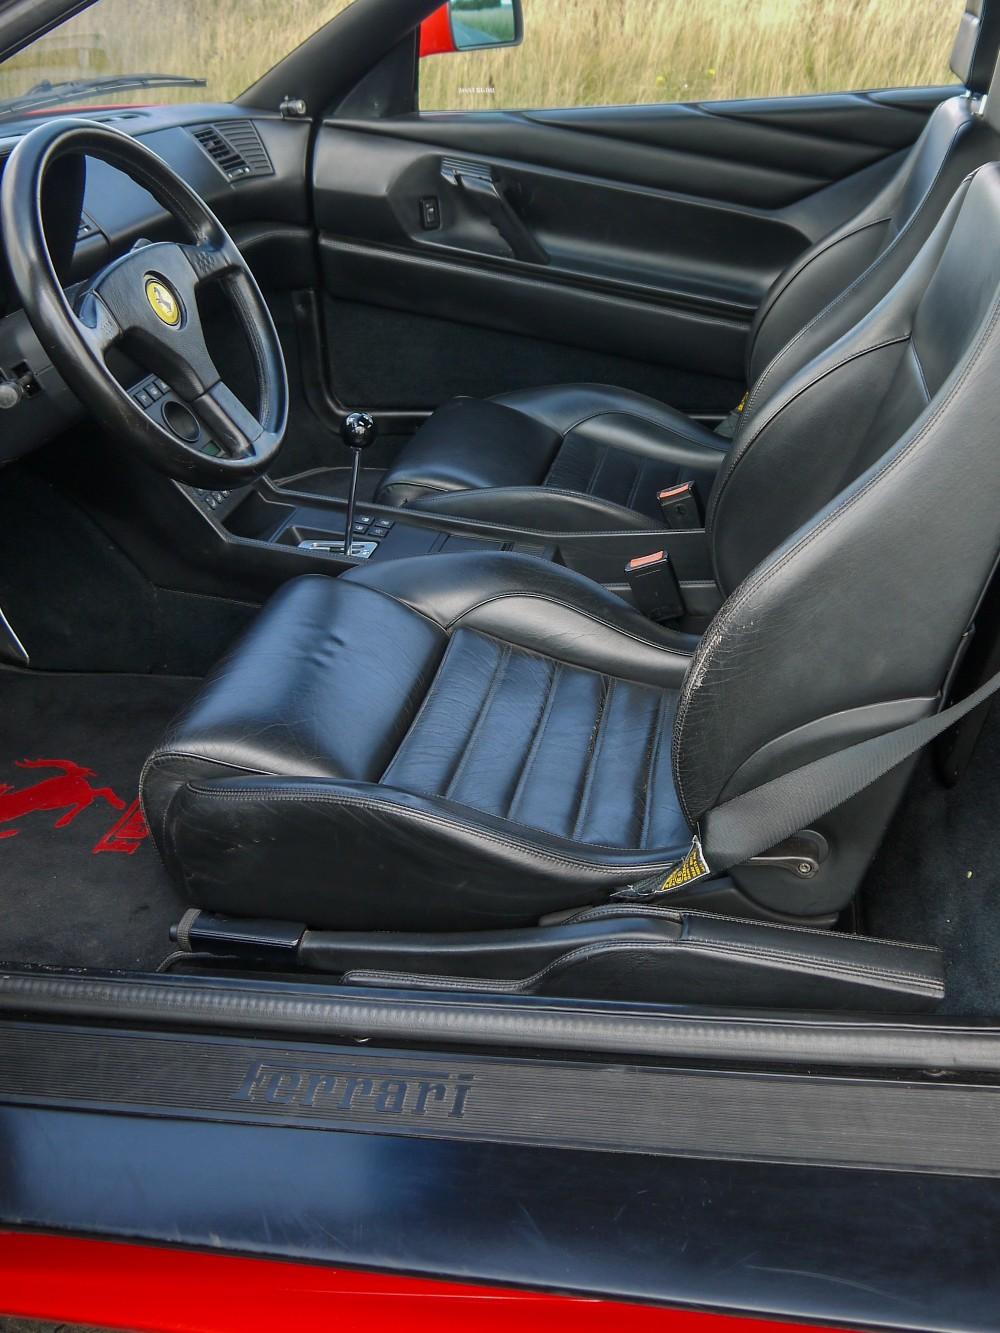 1993 FERRARI 348 TRASVERSALE BERLINETTA Registration Number: L796THC Chassis Number: - Image 24 of 49